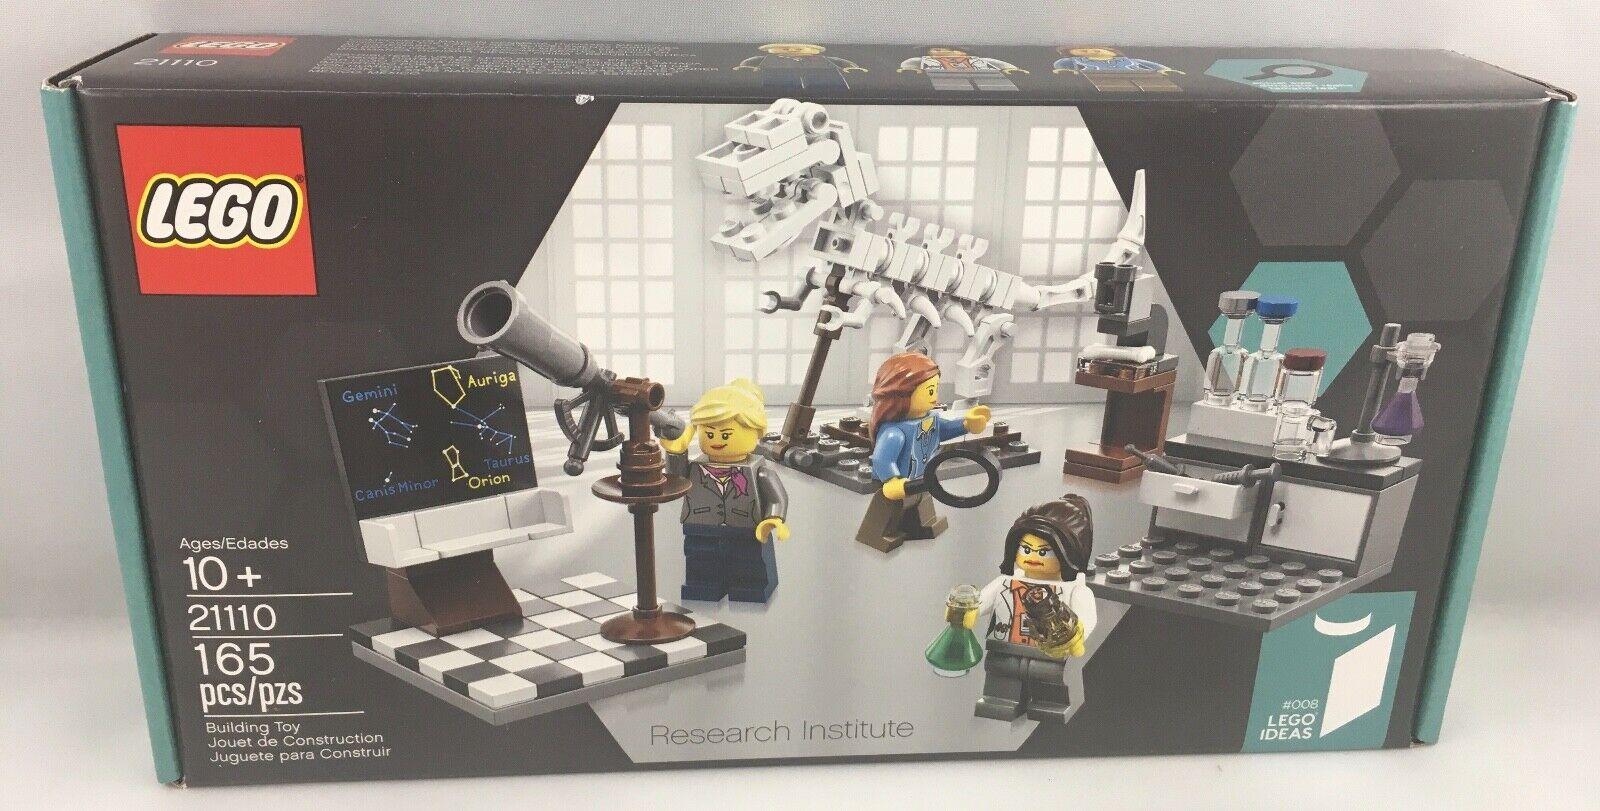 LEGO Research Institute 21110 IDEAS #008 paleontologist astronomer chemist